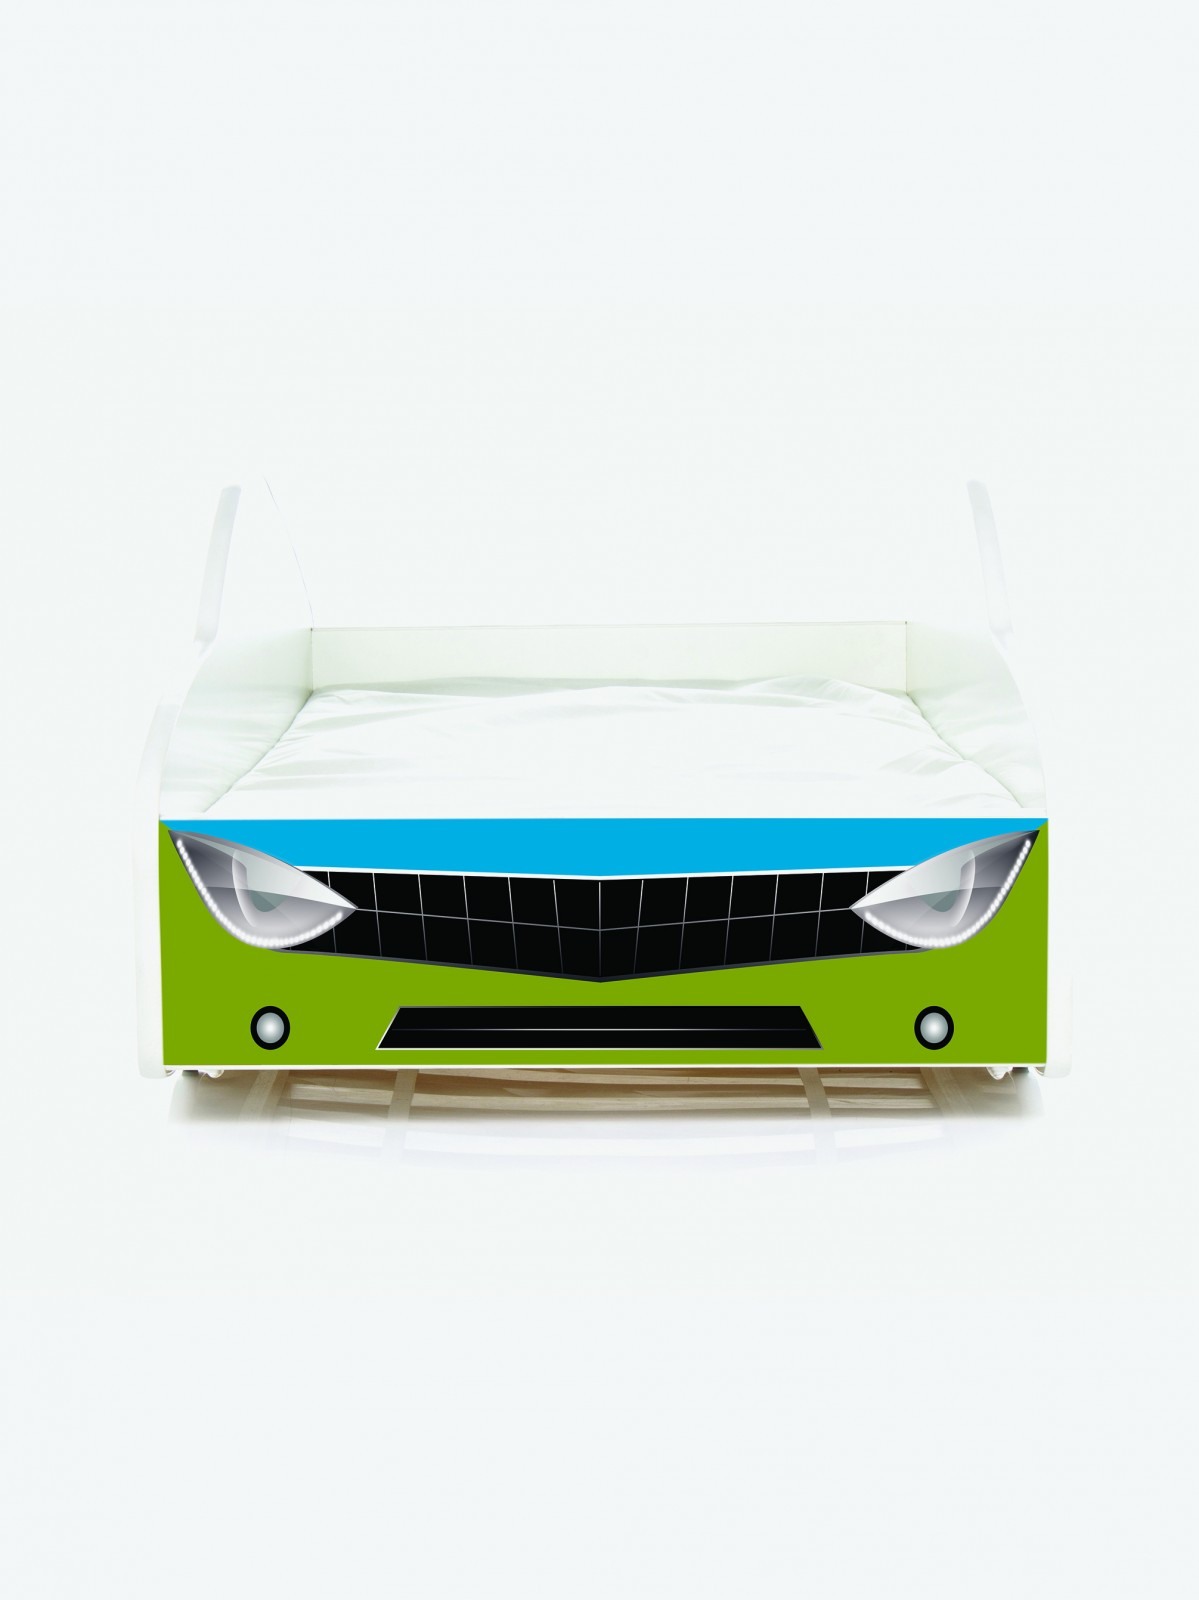 auto kinderbett nobiko mit matratze und lattenrost oliv blau 8 180x80cm. Black Bedroom Furniture Sets. Home Design Ideas